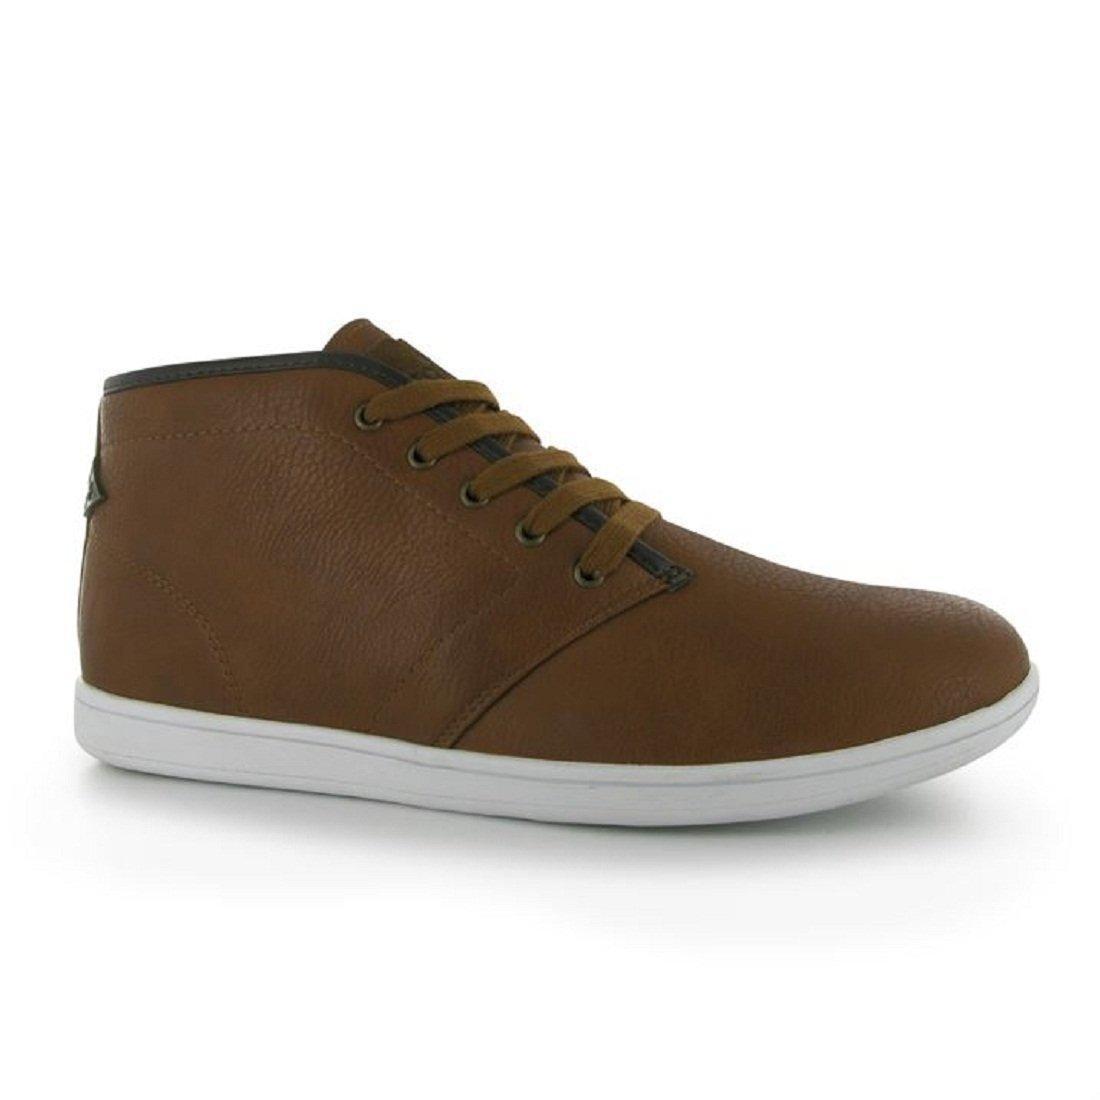 Mens Soviet Whitehall Mid Boot Shoes Tan (UK 10 / US 10.5)